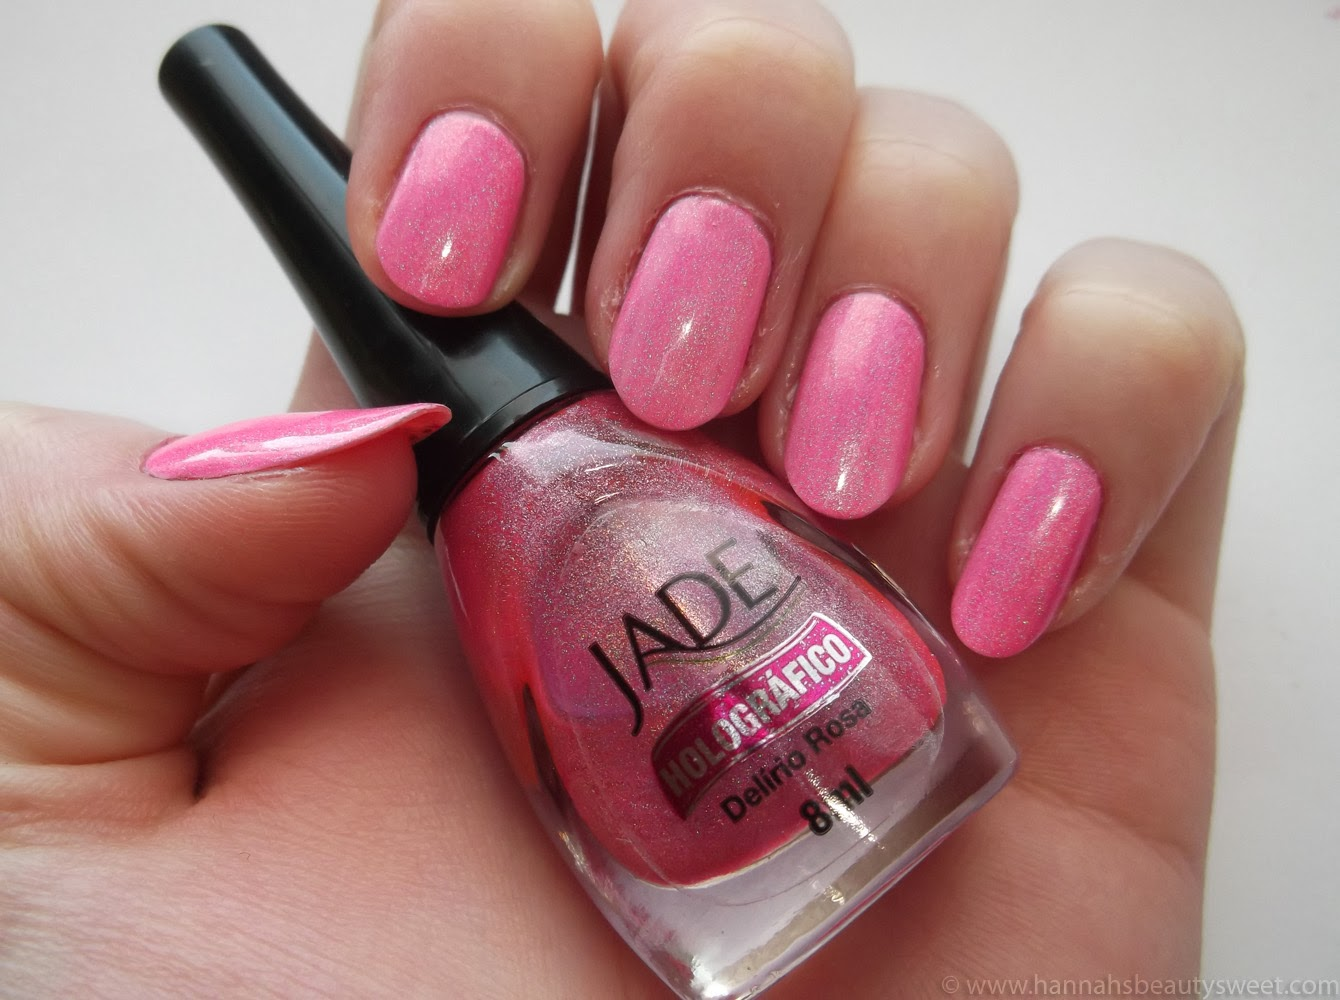 Jade Delirio Rosa, NOTD, holographic nail polish, Delirio Rosa, pink, sparkly, holographic pink